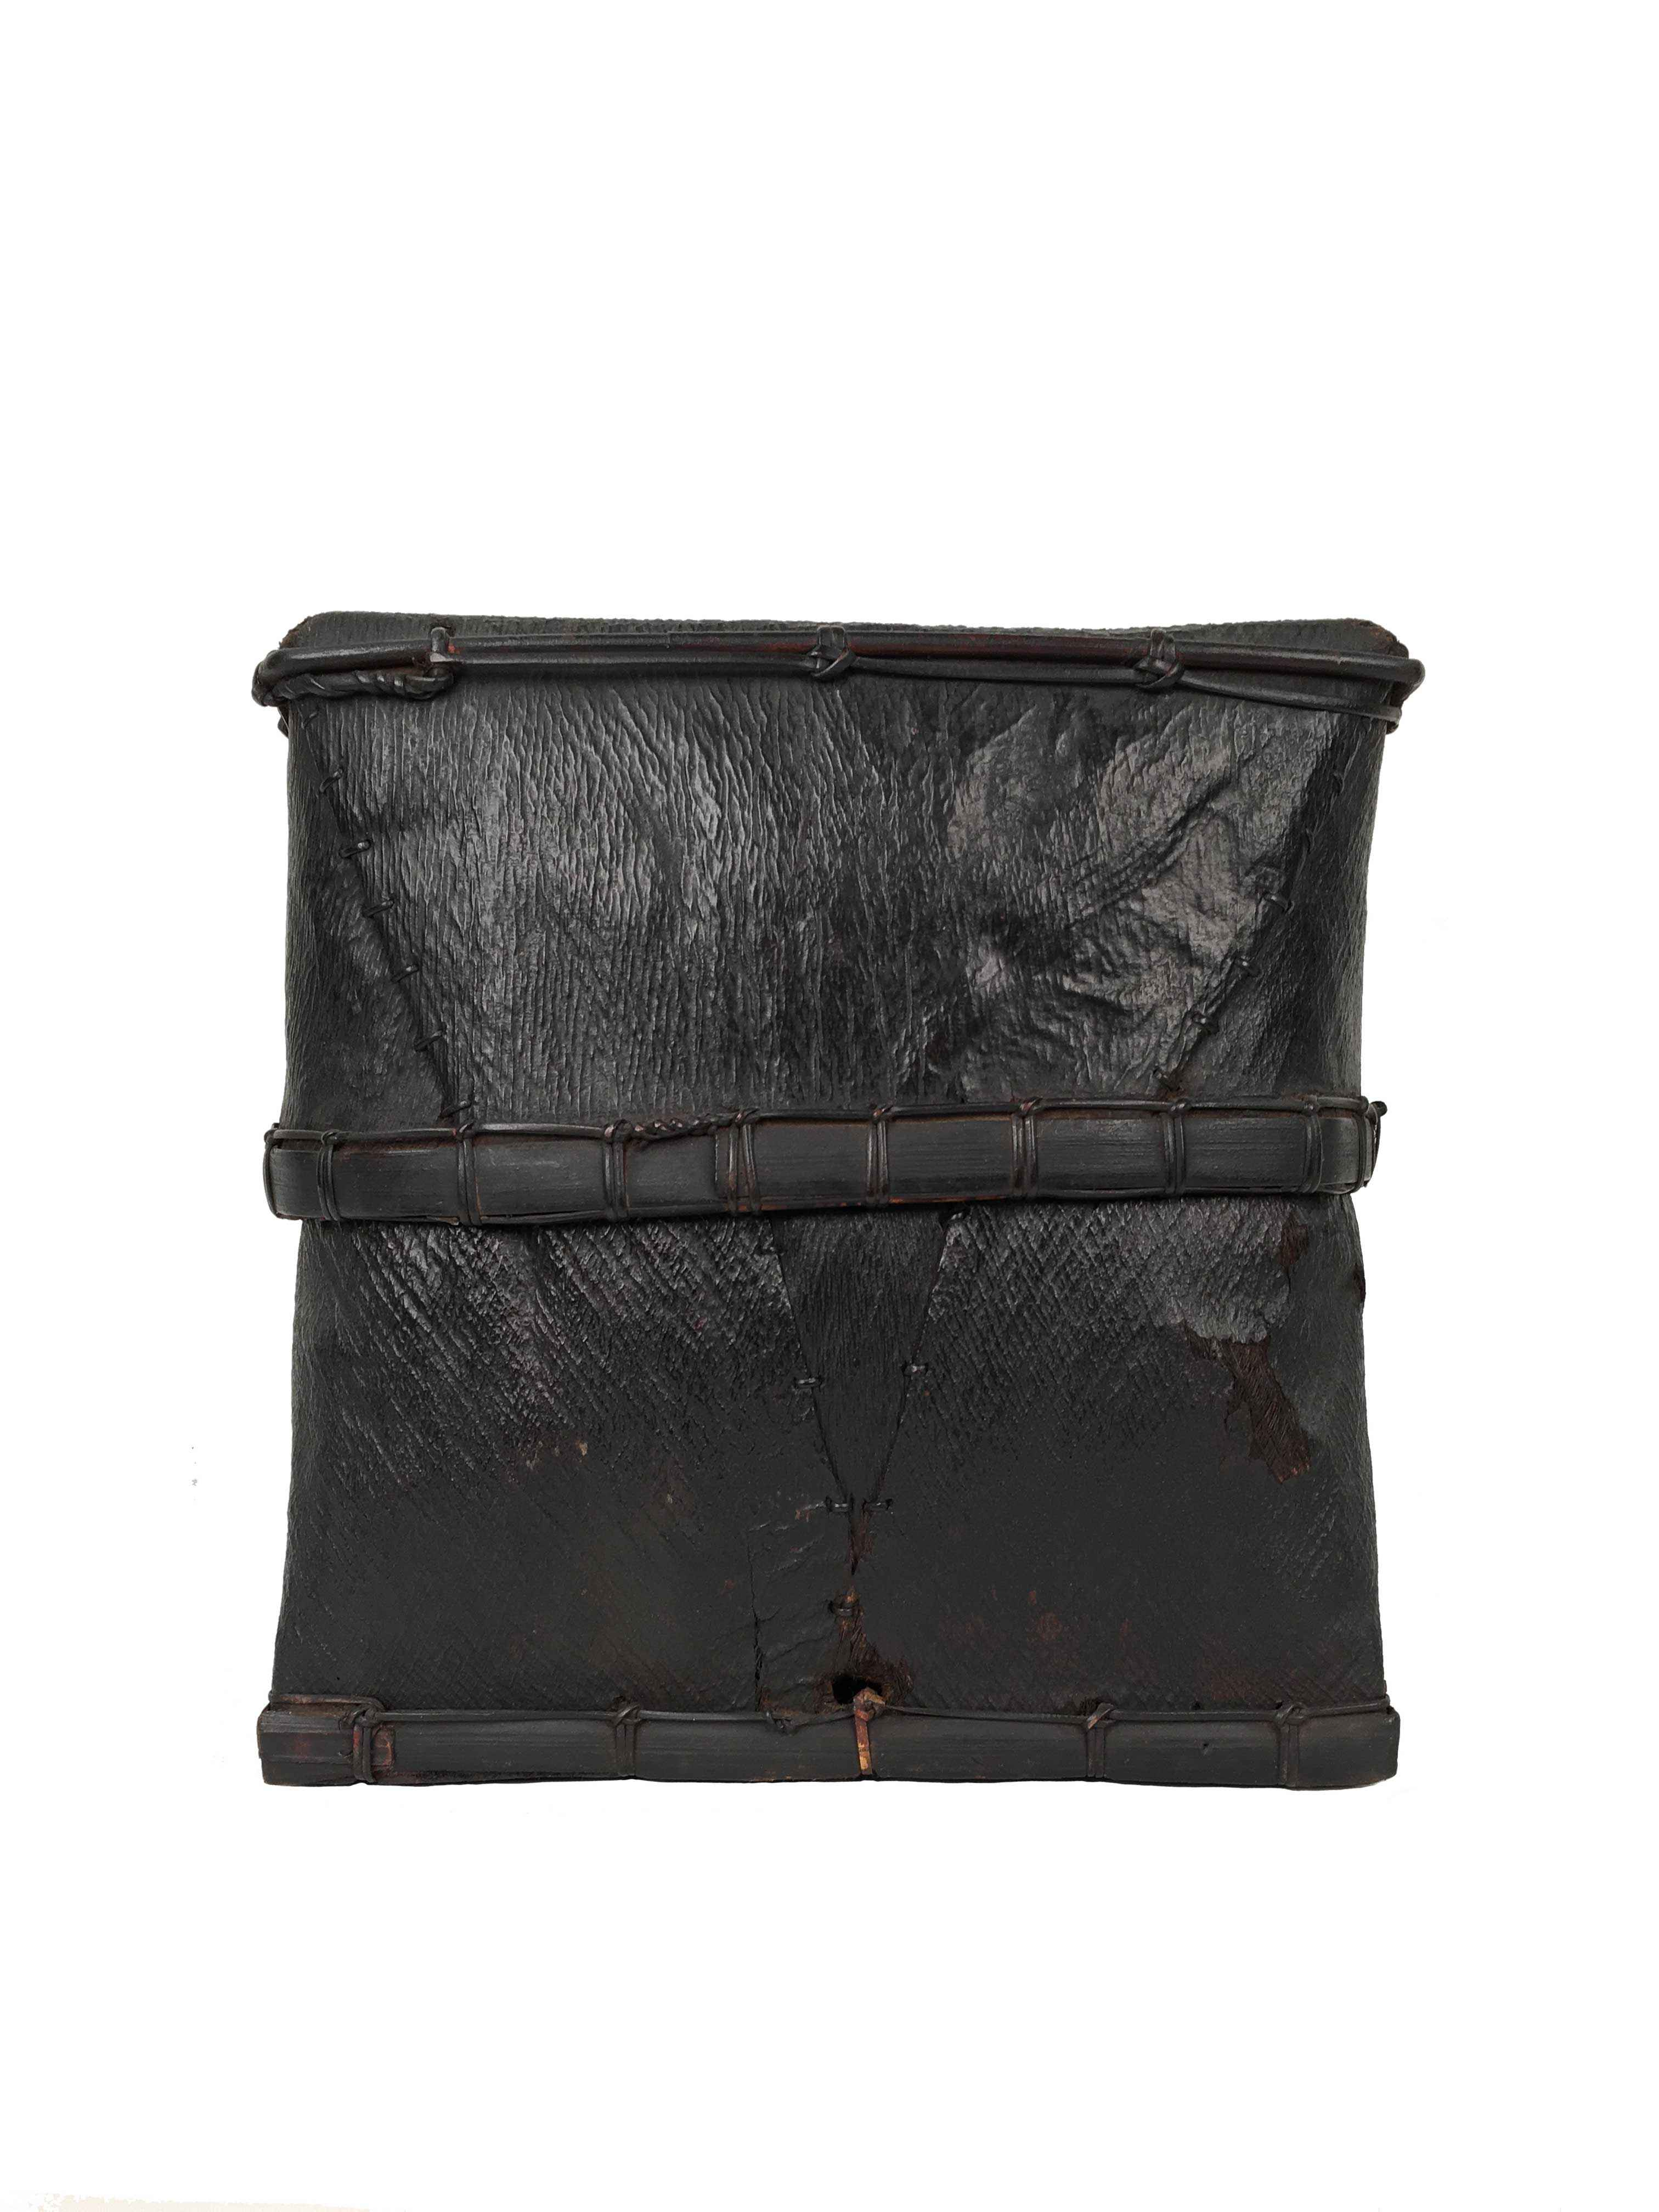 BORNEO BARK BOX by    - Masterpiece Online